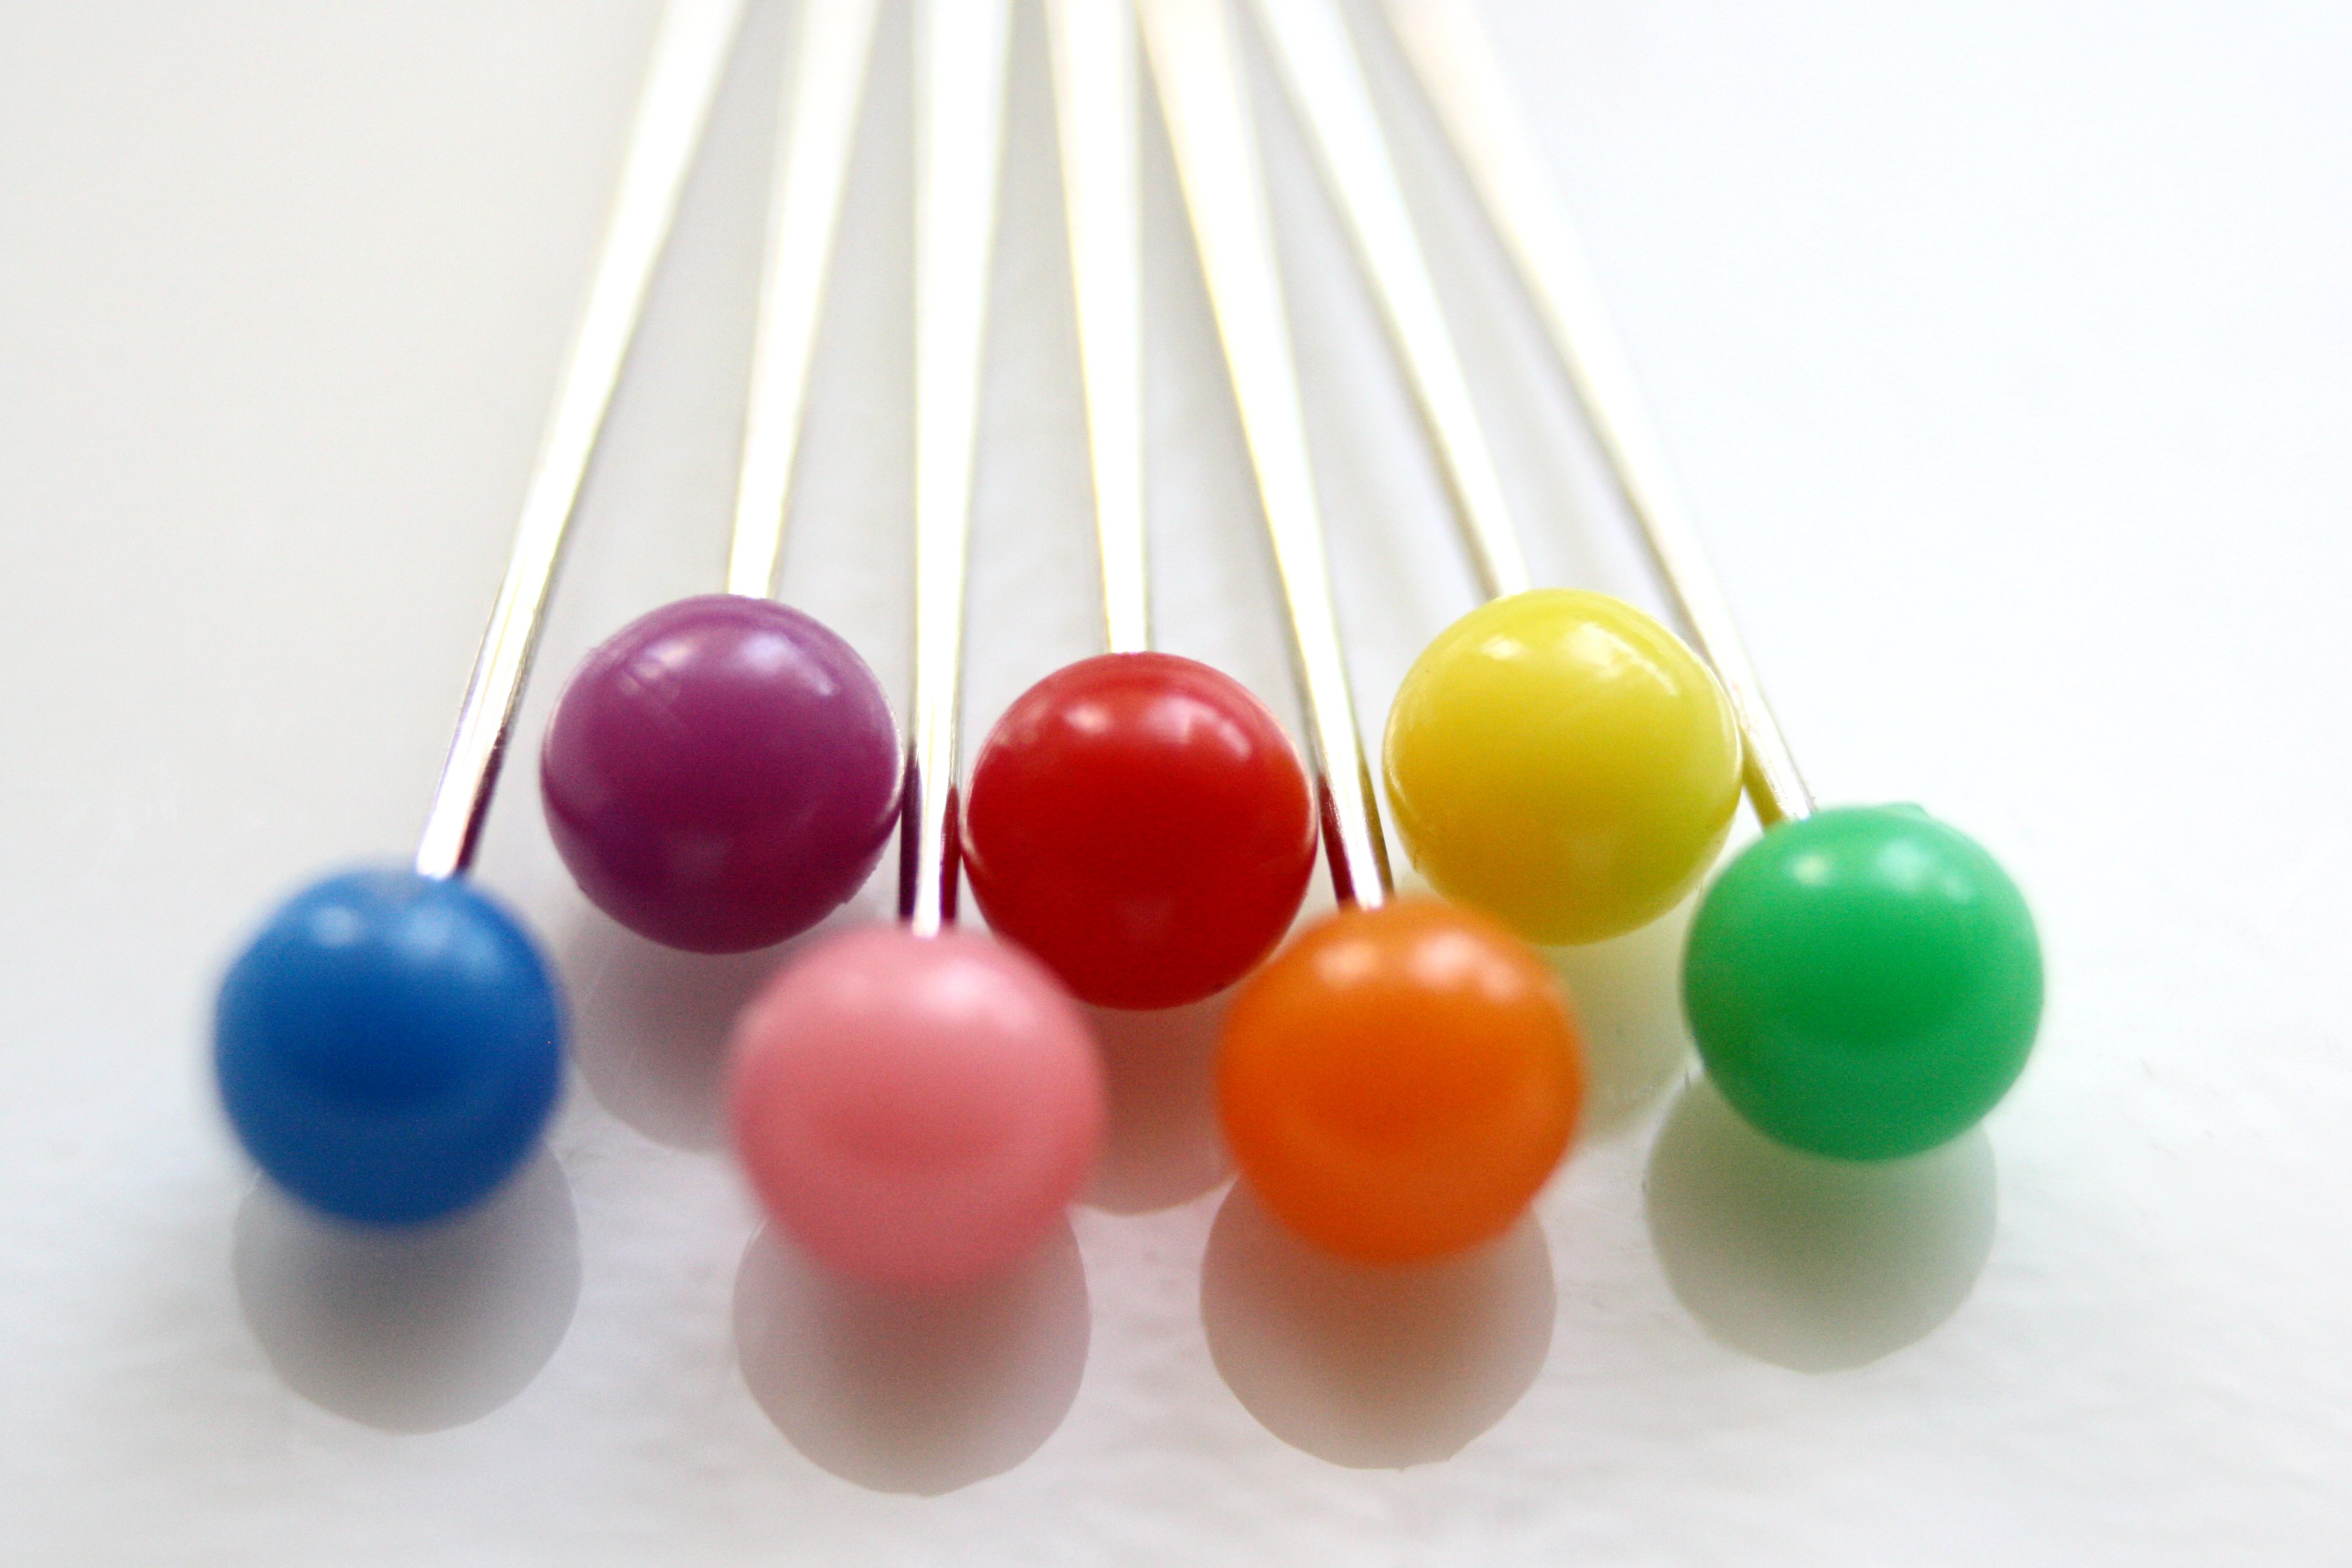 Hot sale 250pcs Glass Pearlized Head Pins Multicolor White